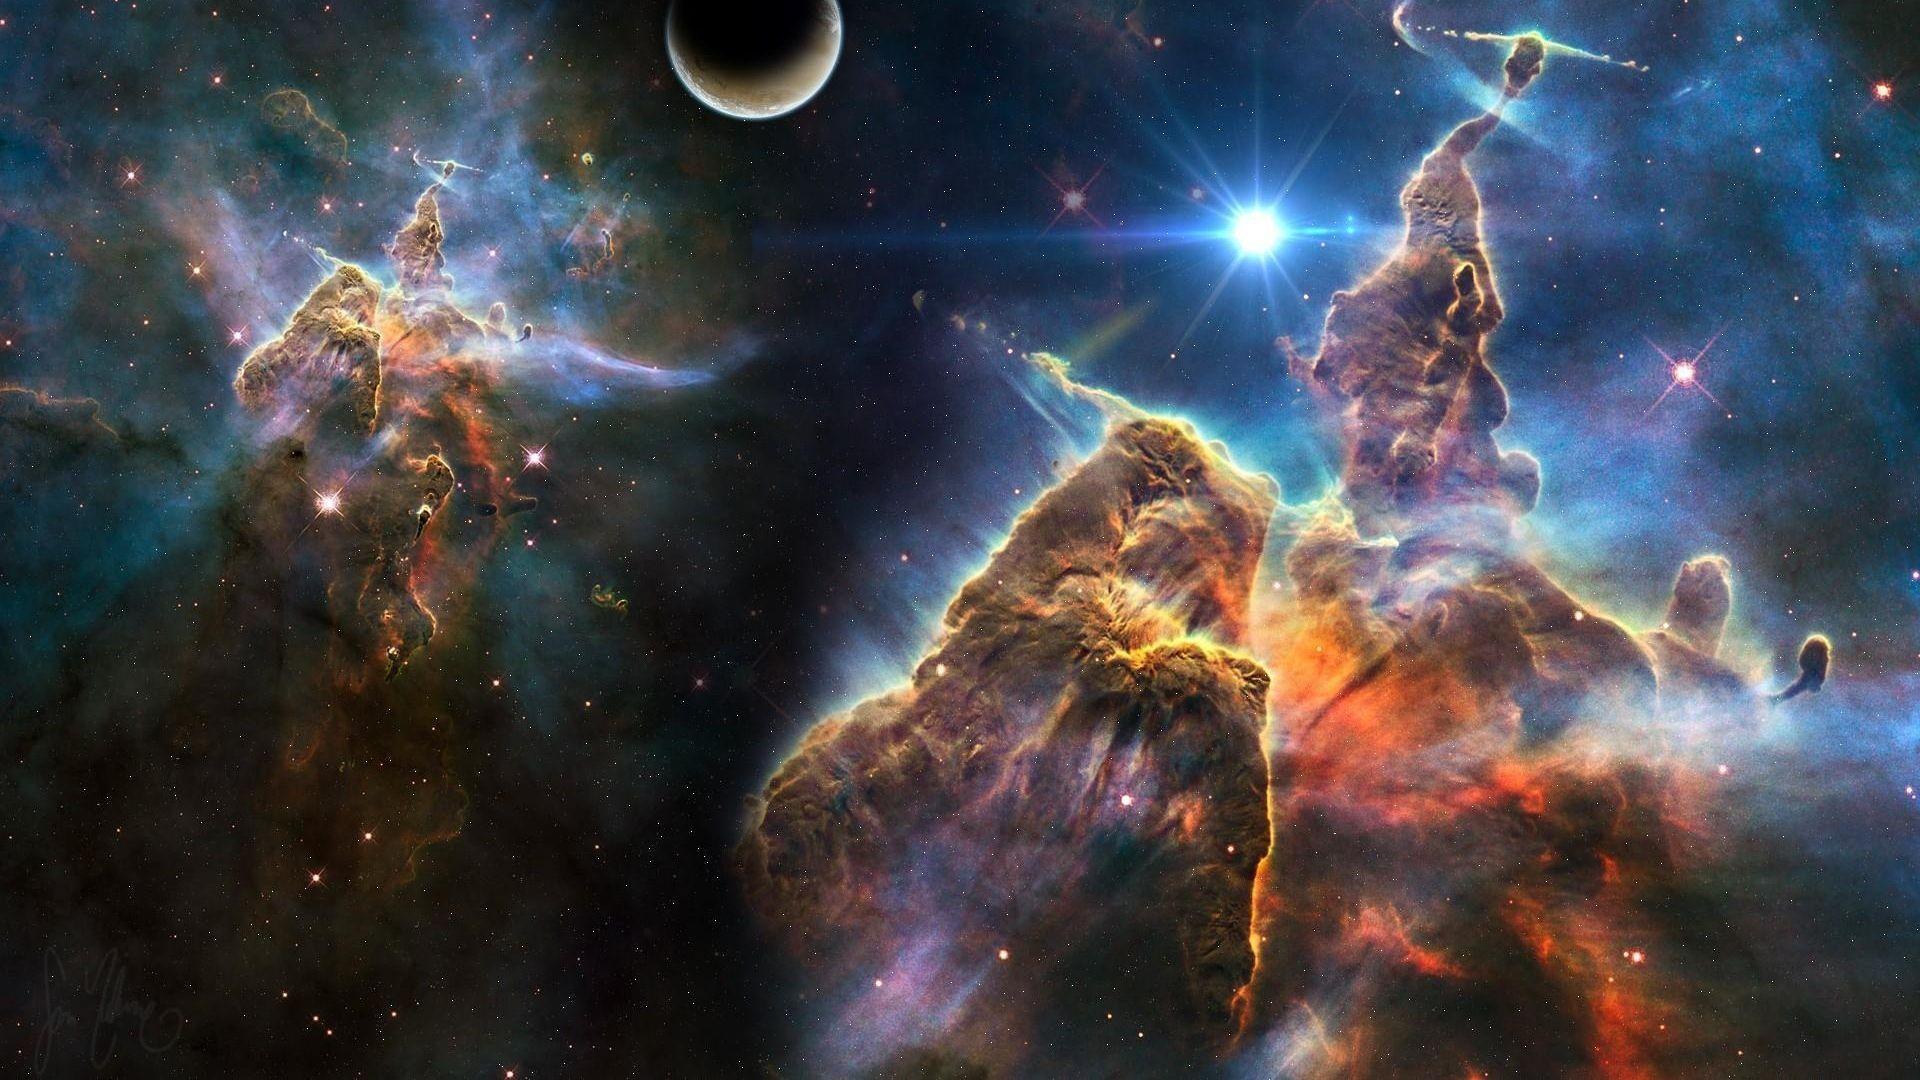 4k universe wallpapers top free 4k universe backgrounds for Sfondi desktop universo